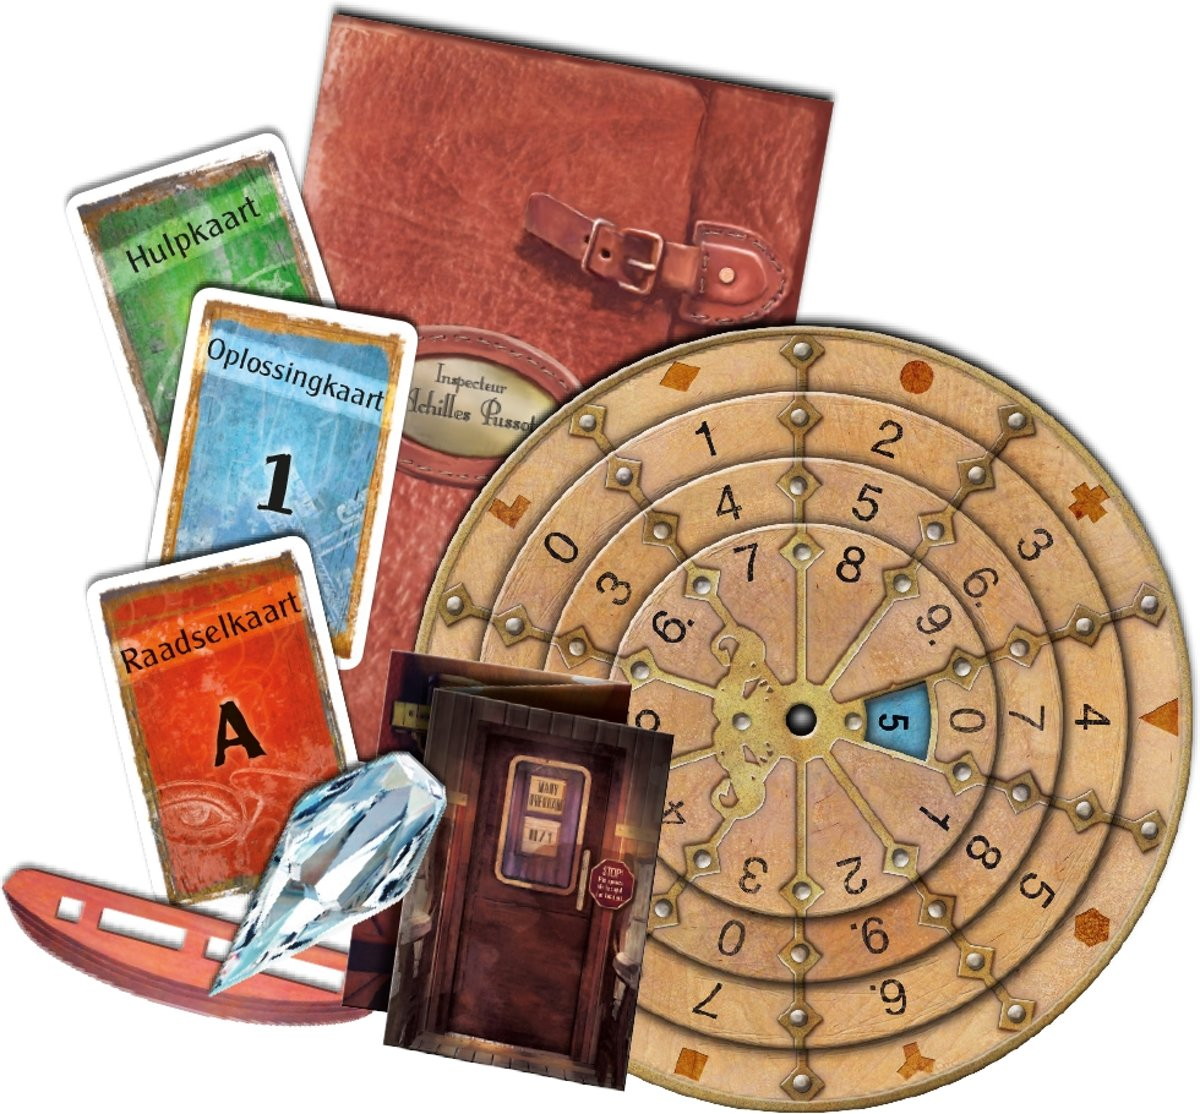 687a3bffdf4 bol.com   EXIT De dode in de Orient Express - Escape Room - Bordspel, 999  Games   Speelgoed